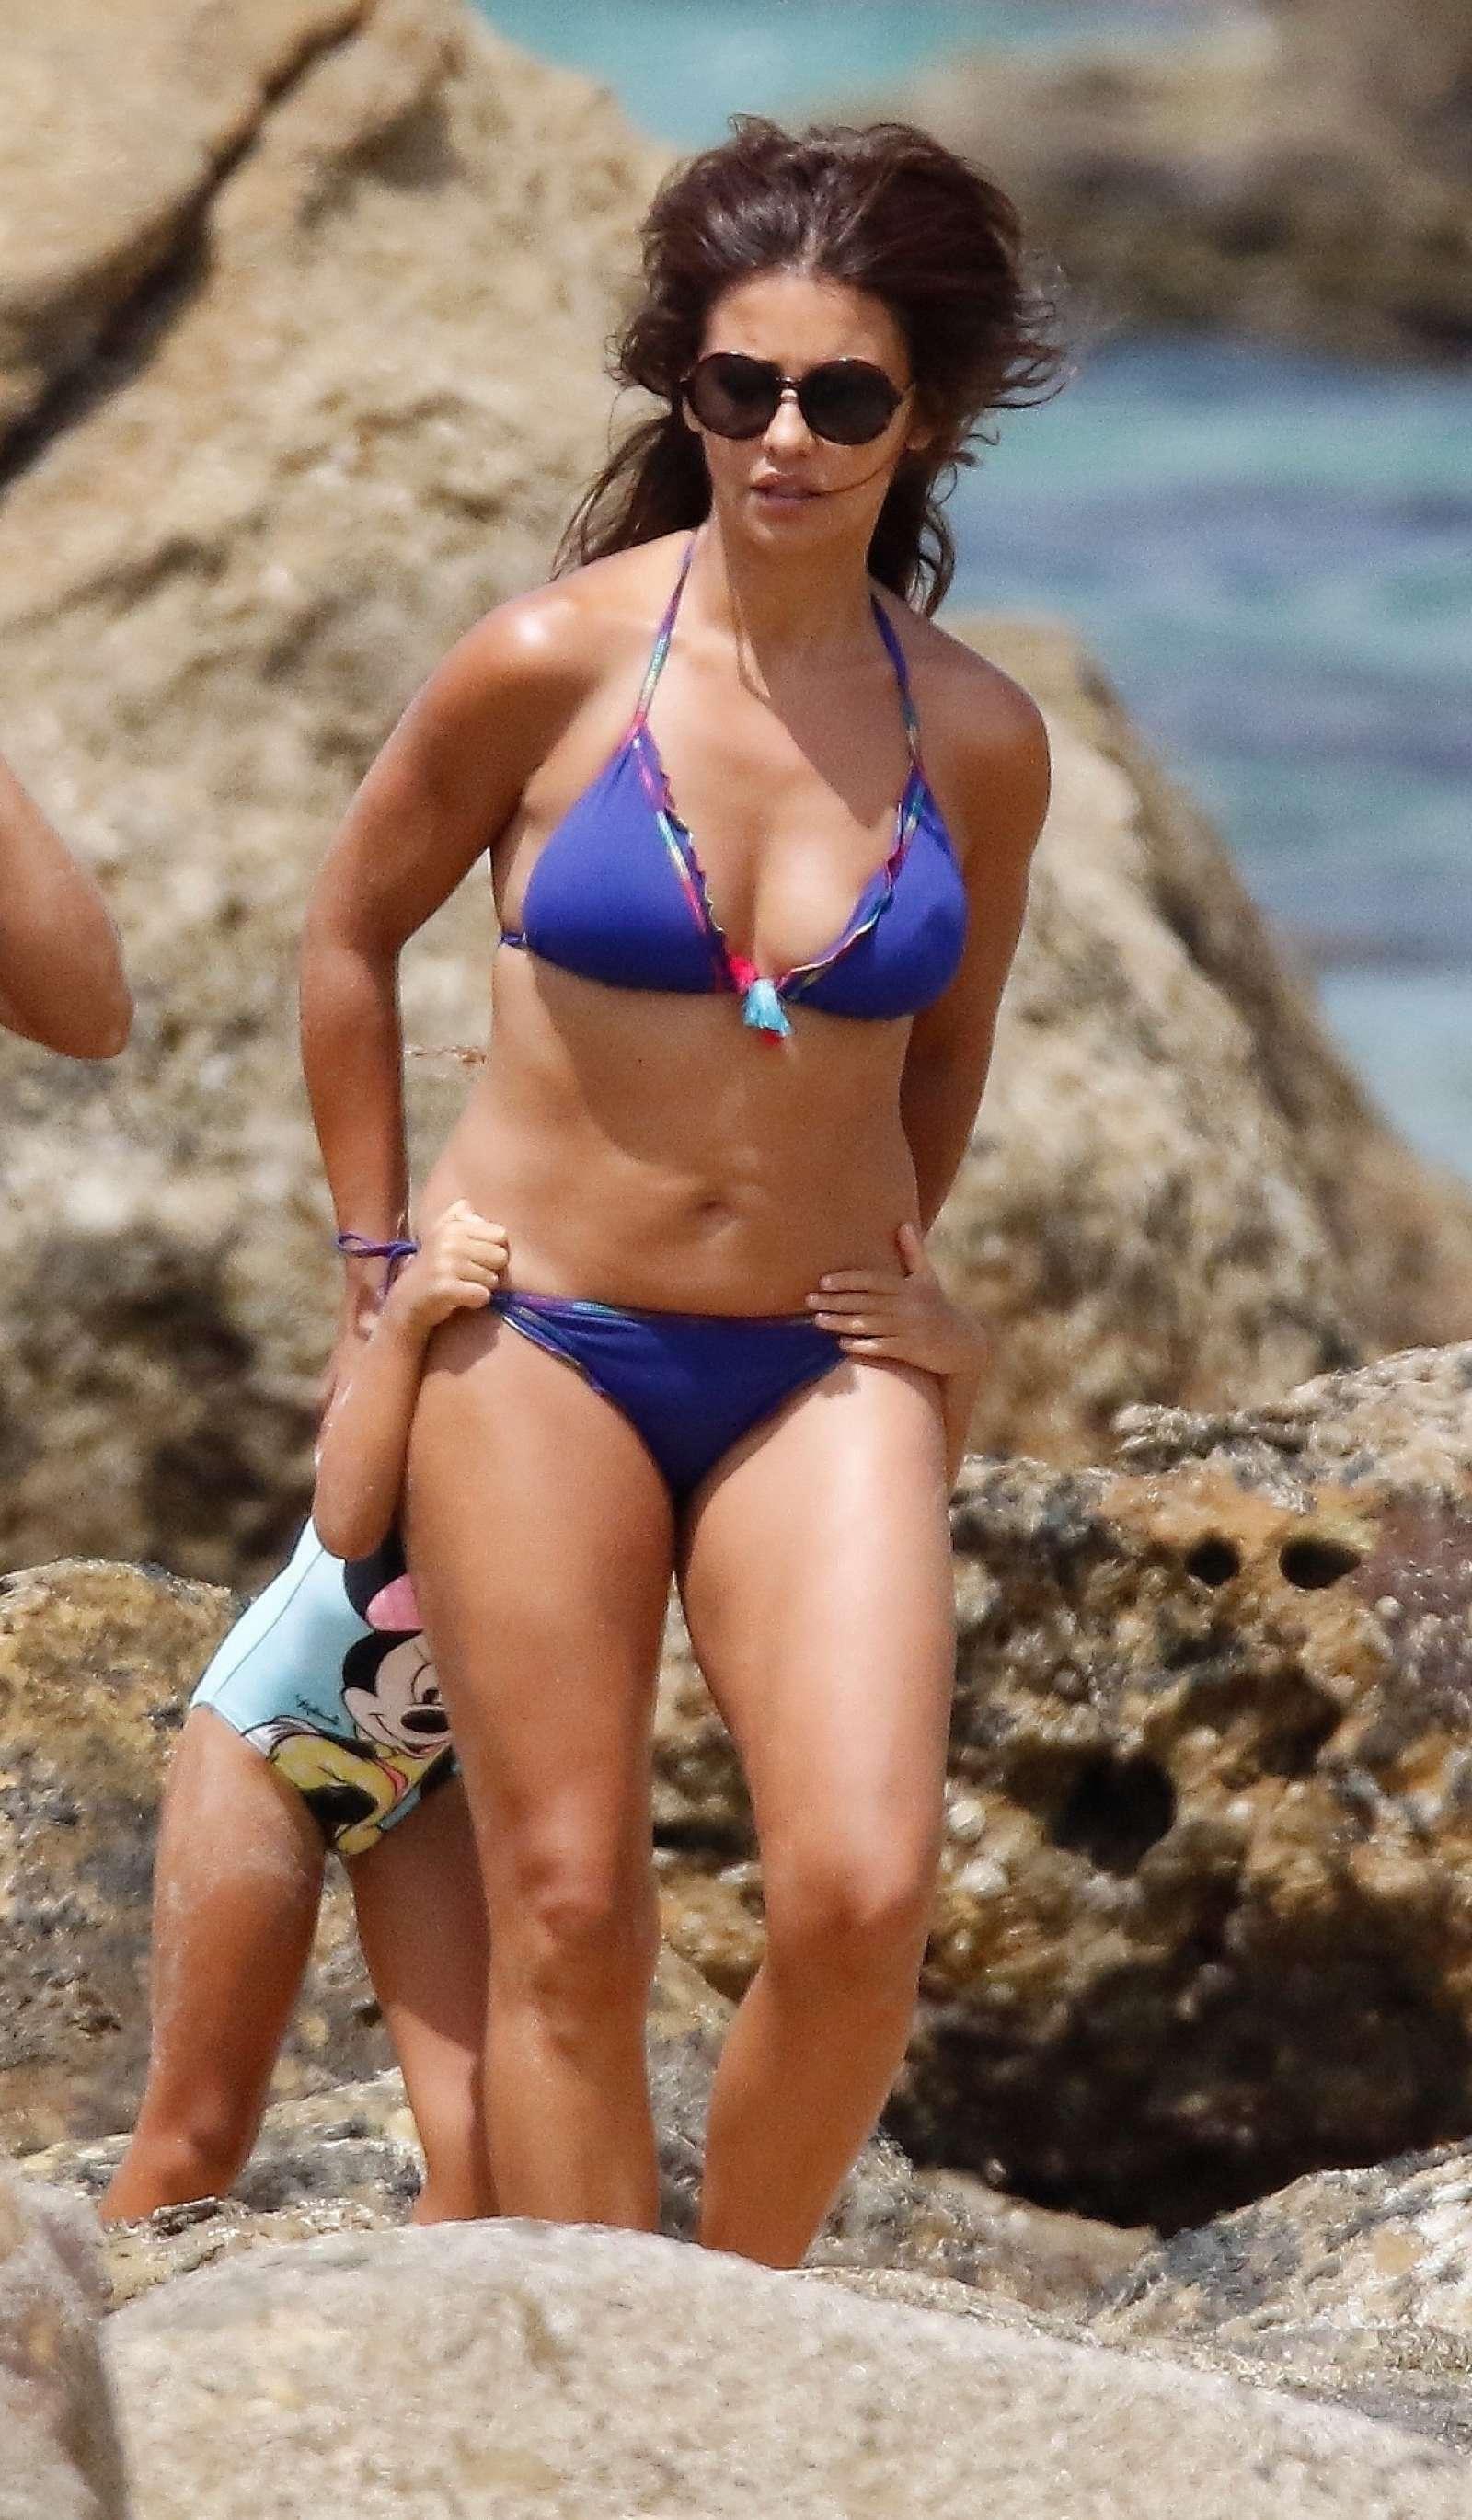 Monica Cruz 2017 : Monica Cruz in Bikini 2017 -91